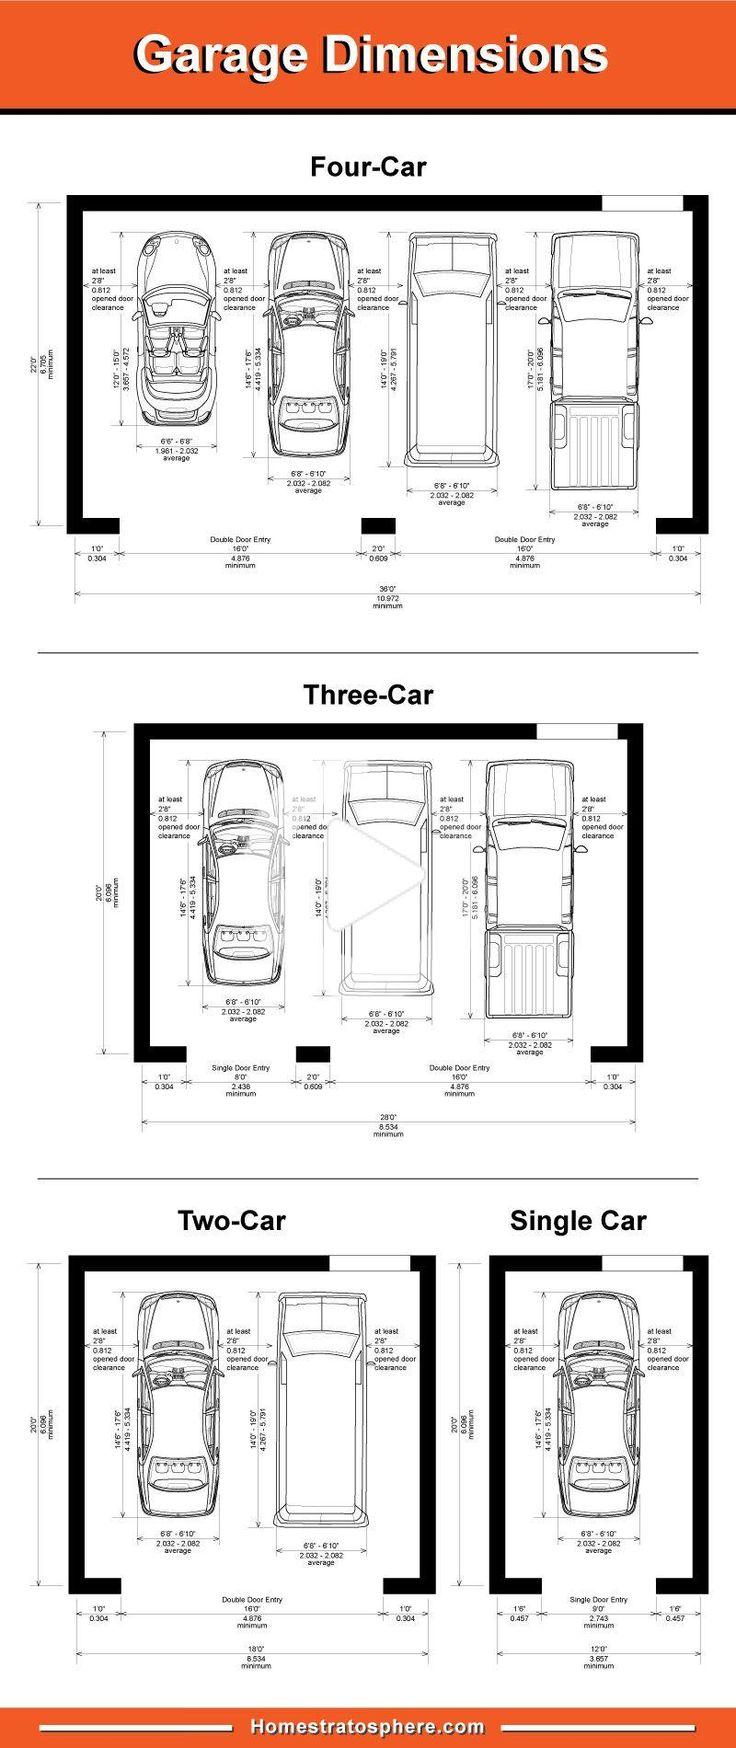 Standard Garage Dimensions for 1, 2, 3 and 4 Car Garages